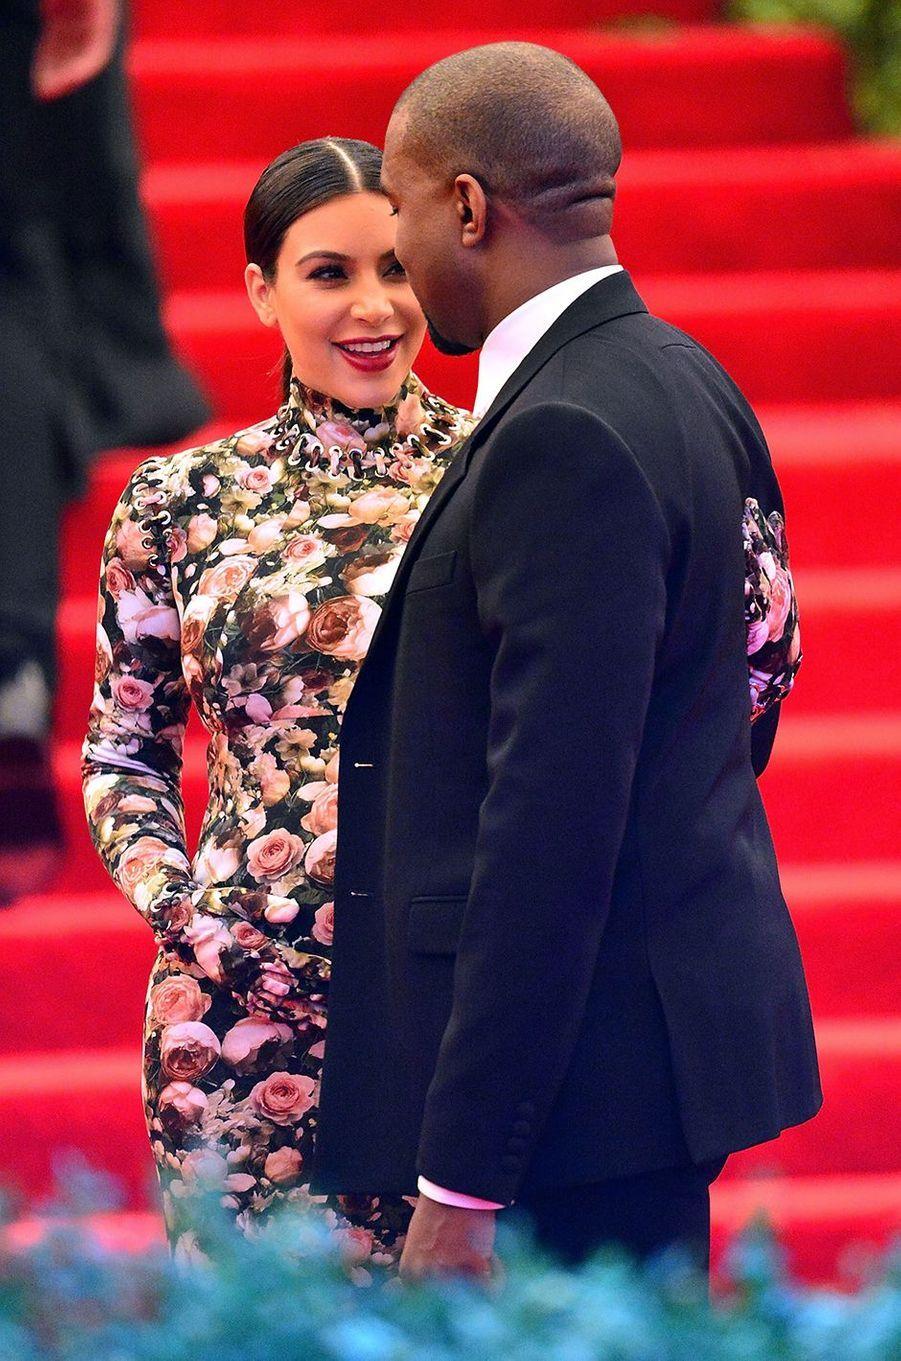 Kim Kardashian et Kanye West au gala du MET à New York en mai 2013